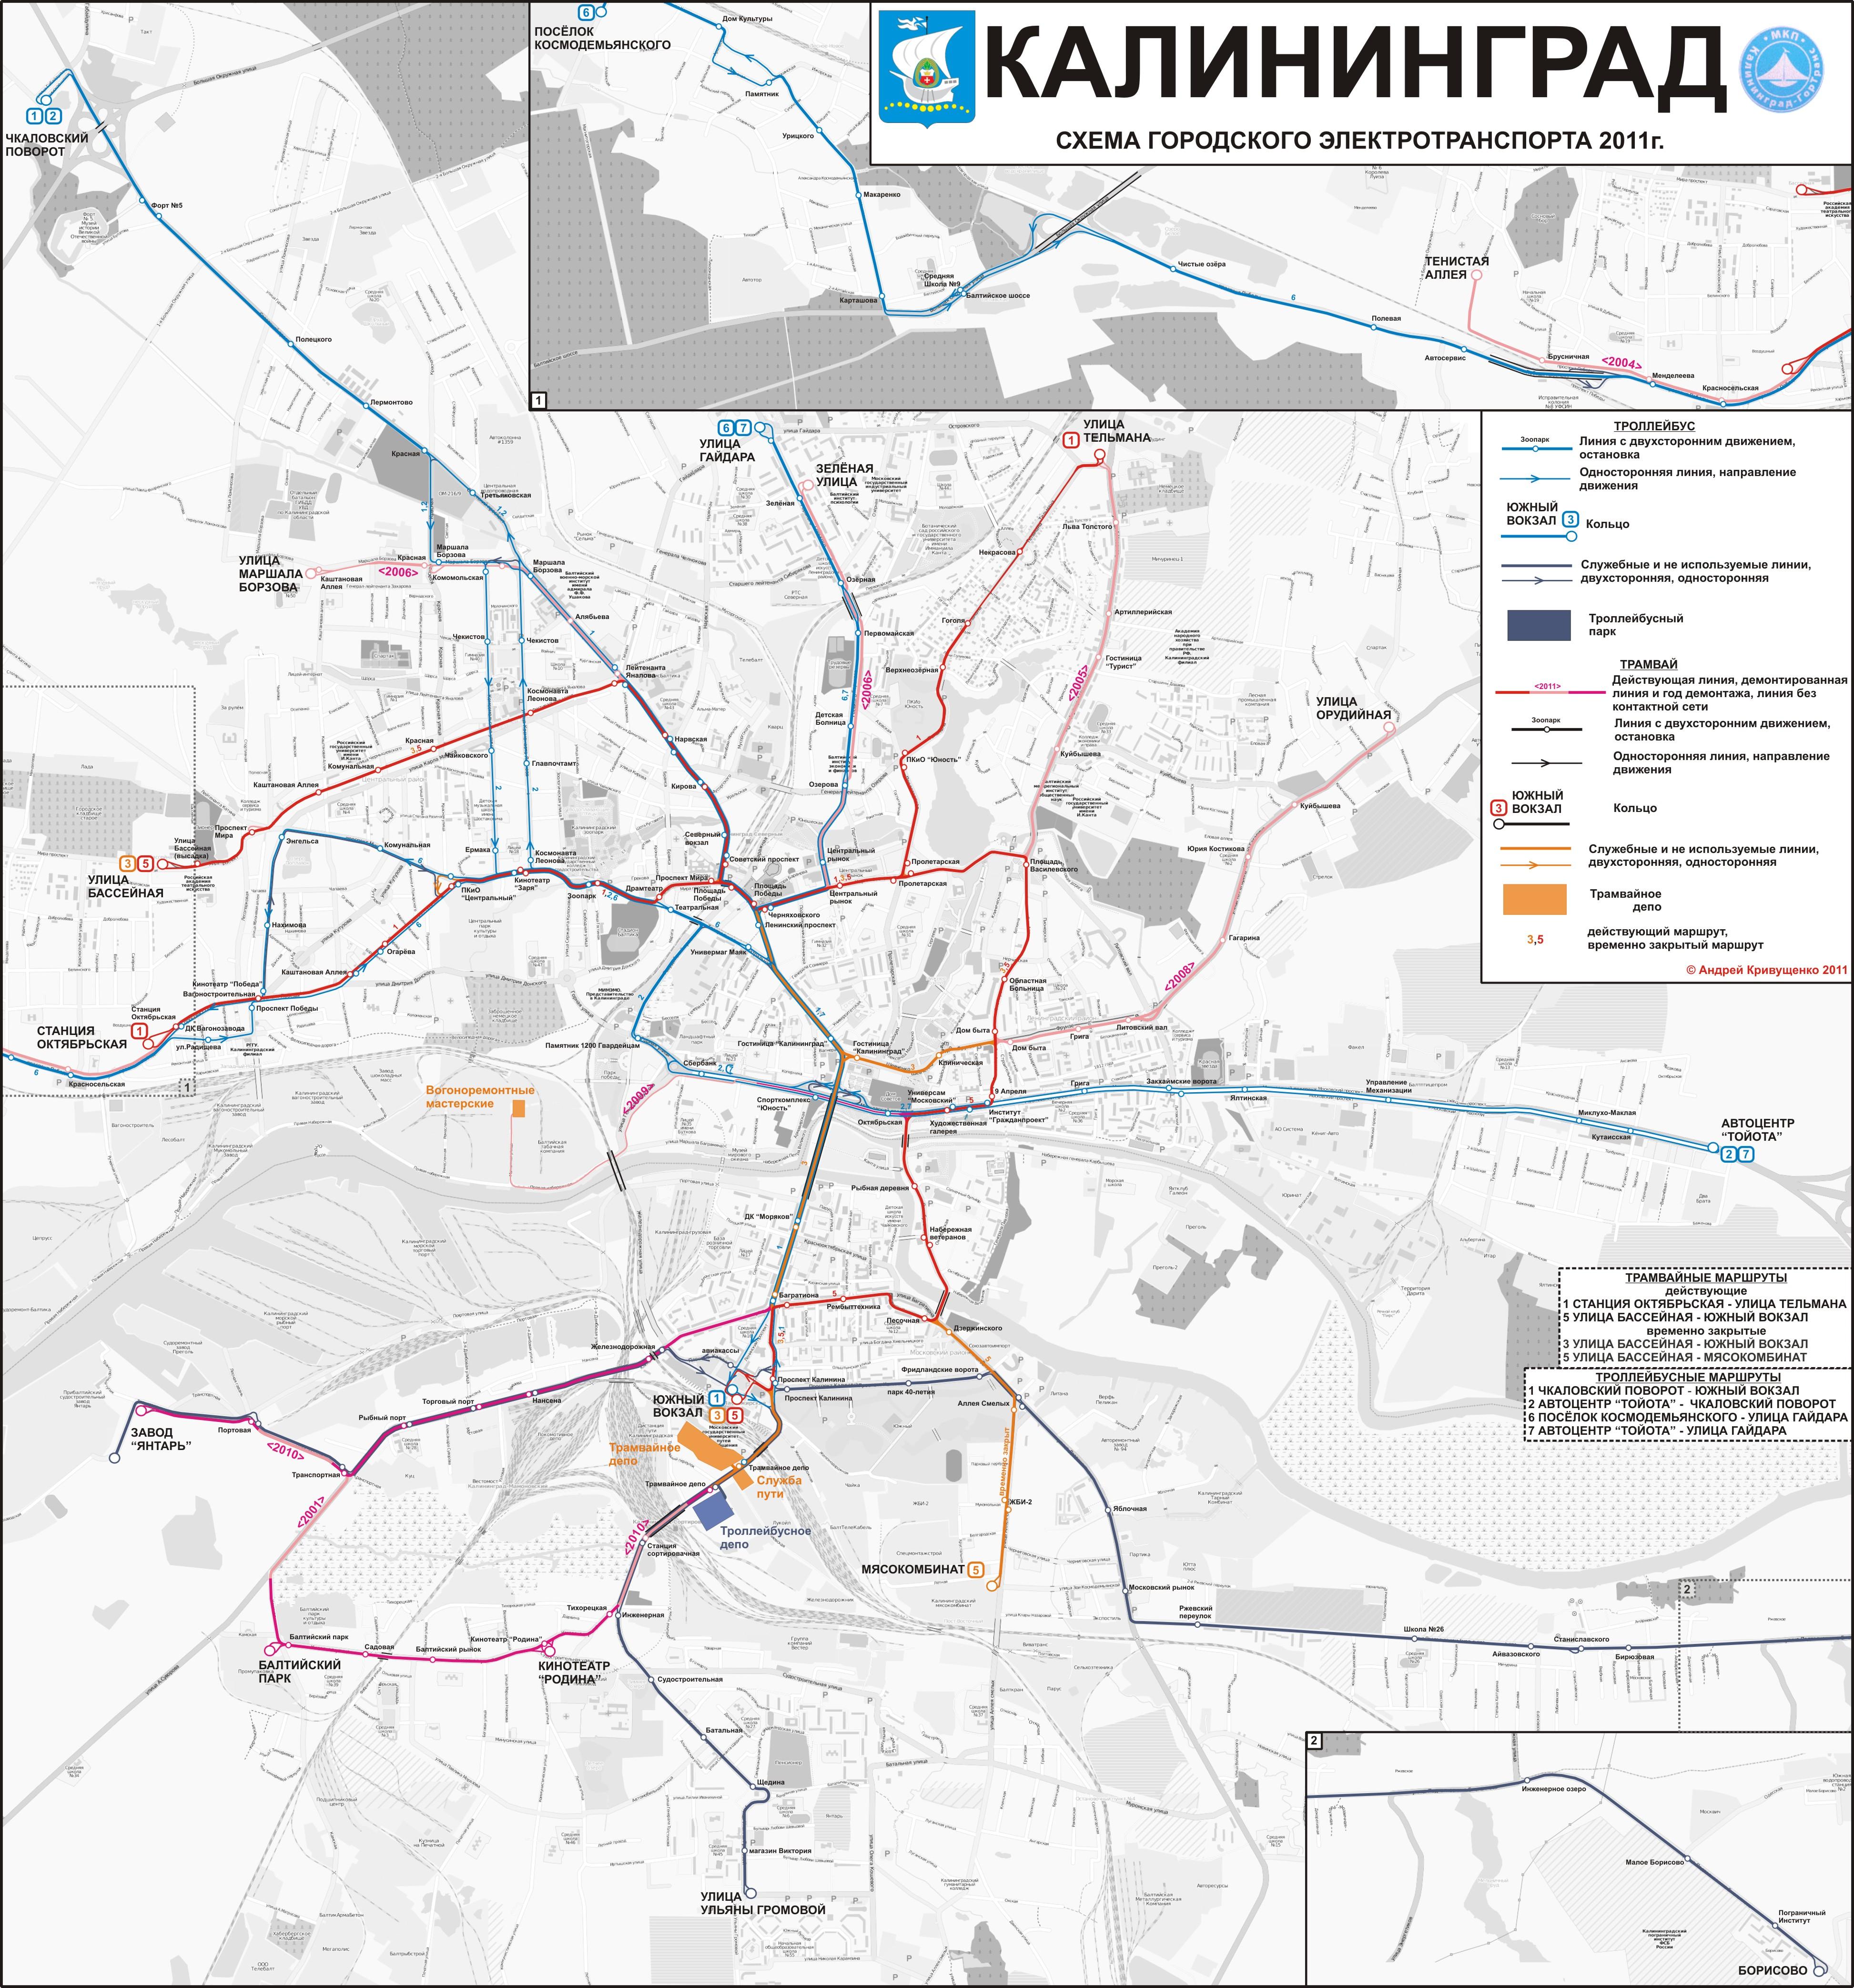 транспортная схема калининграда 2012